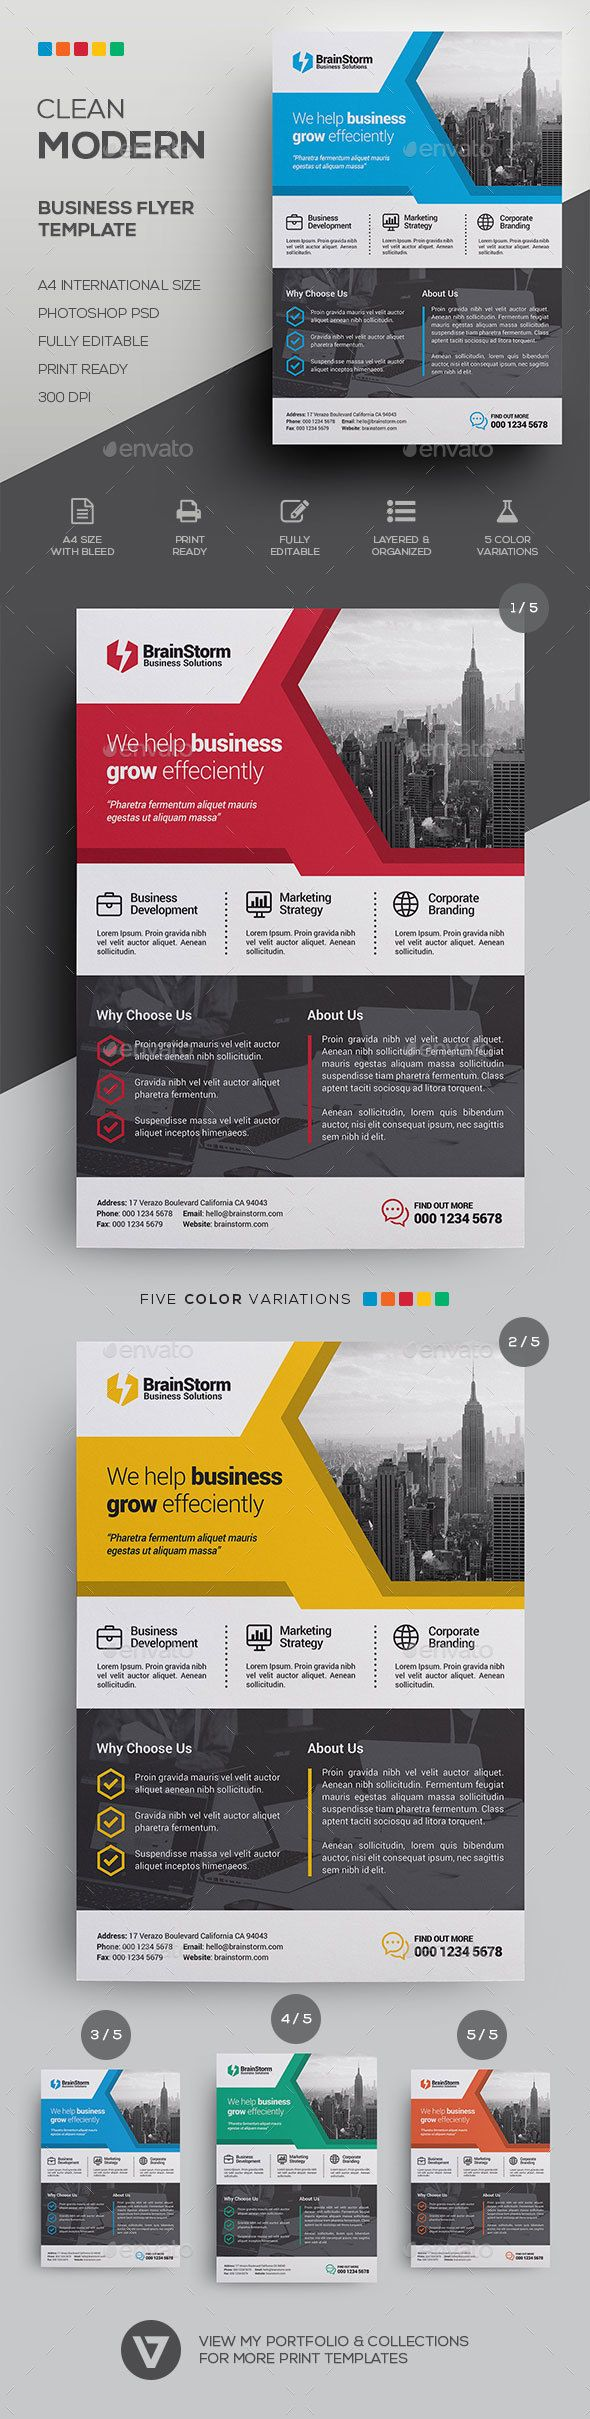 Corporate Business Flyer Template 564 best Design